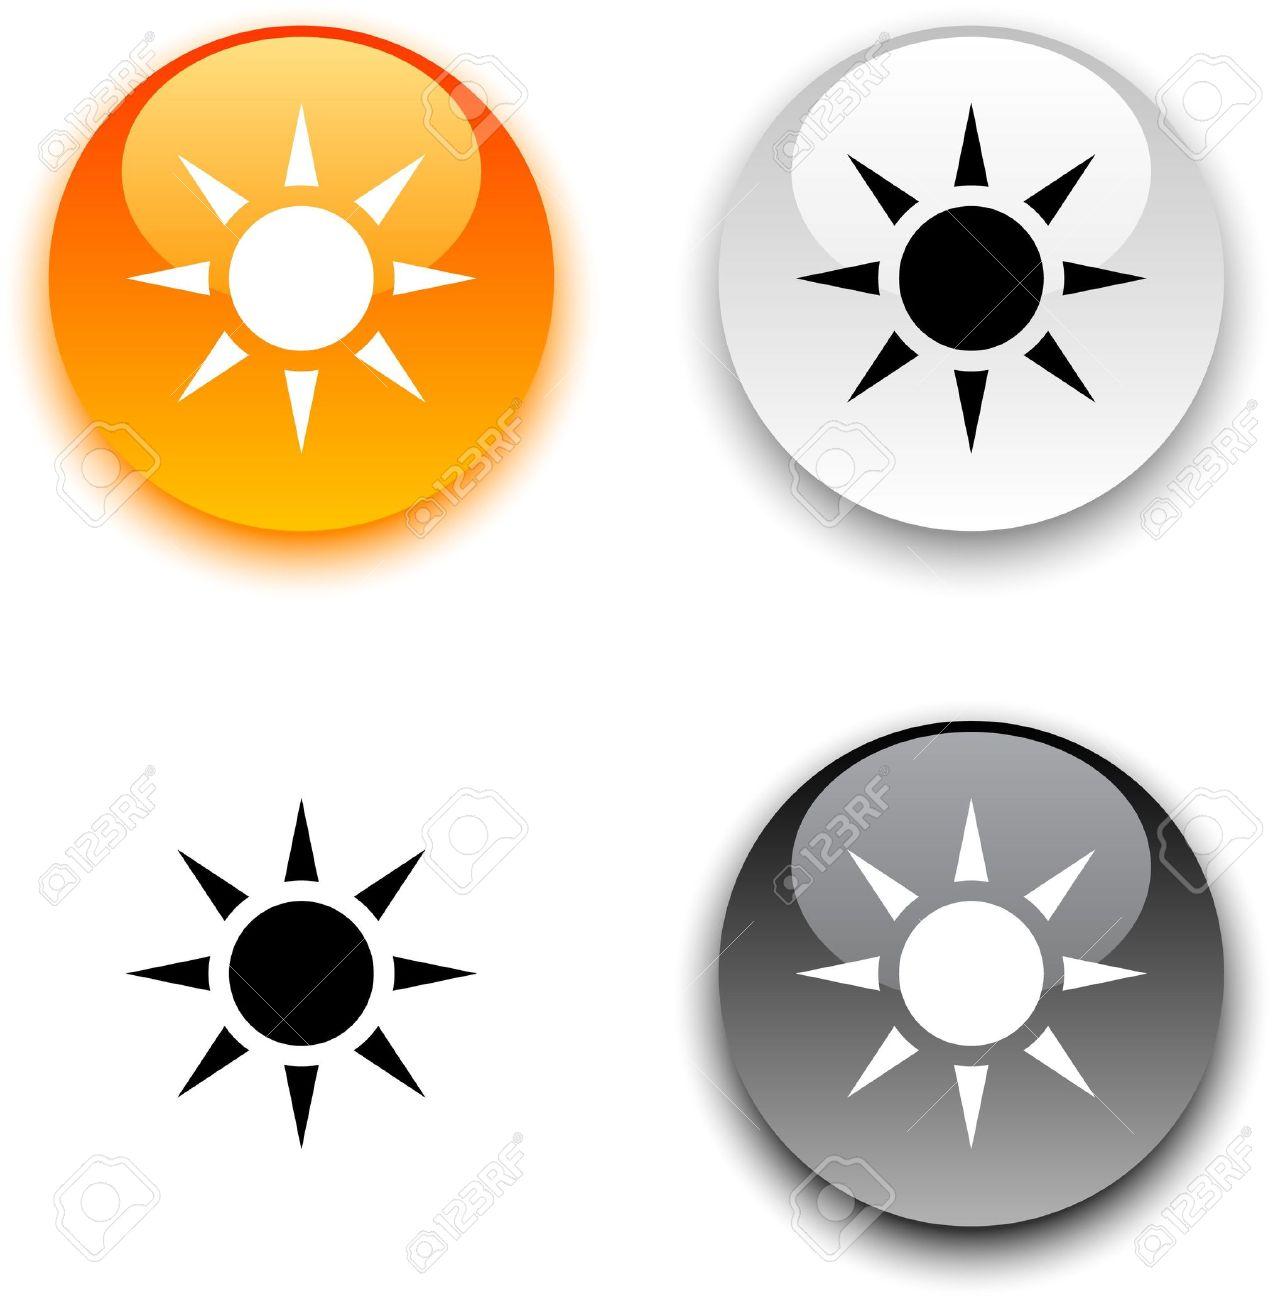 пиктограмма солнца: